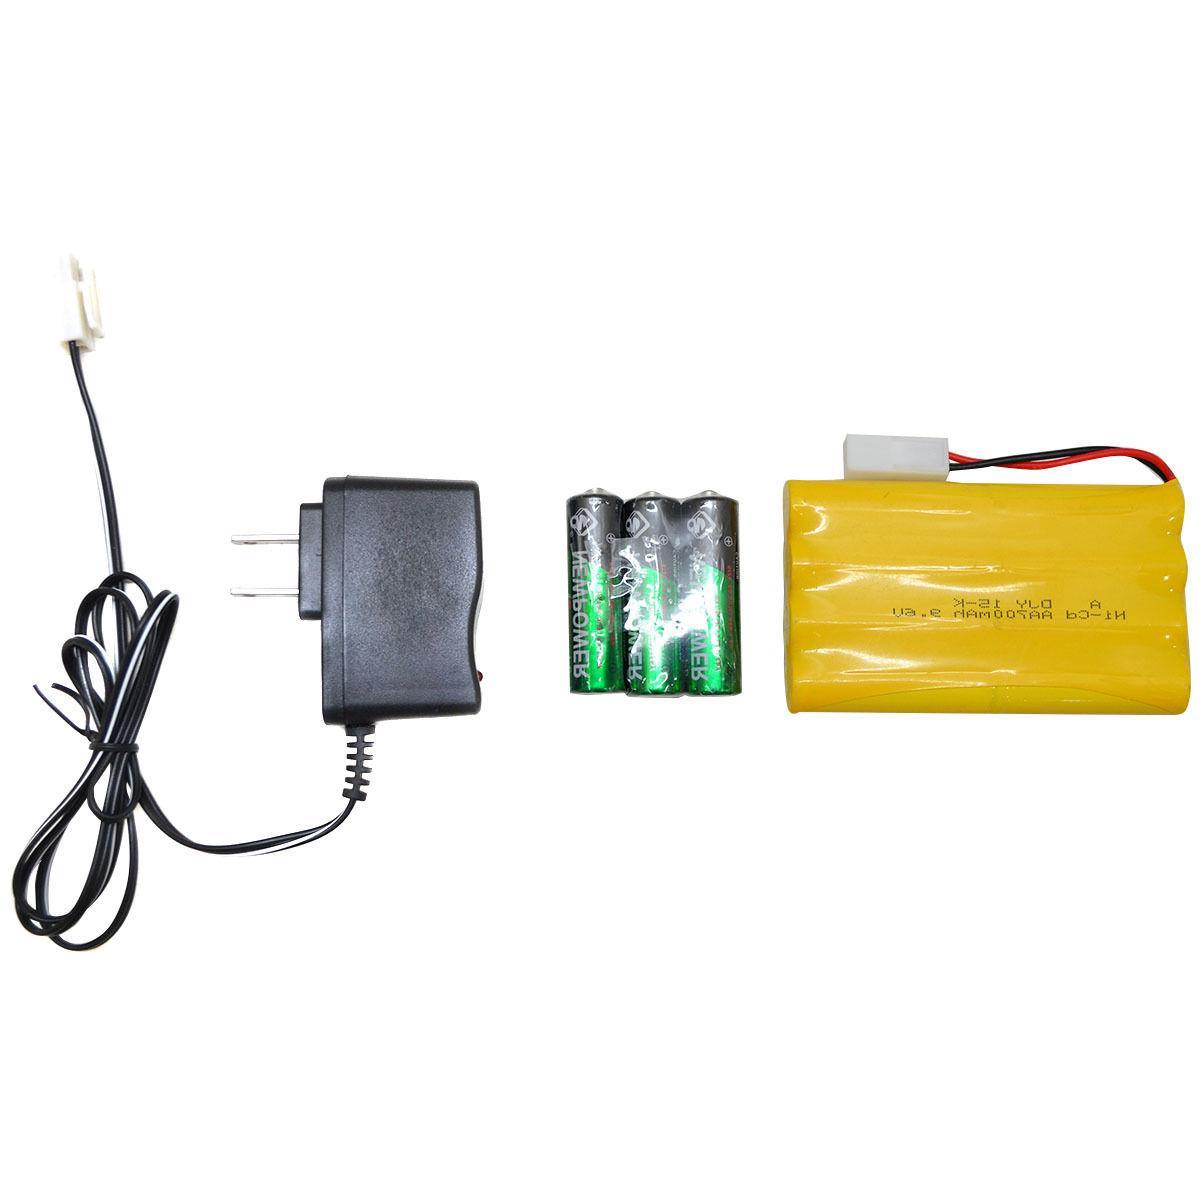 1:10 2.4Ghz Rock Crawler 4 Remote RC Green